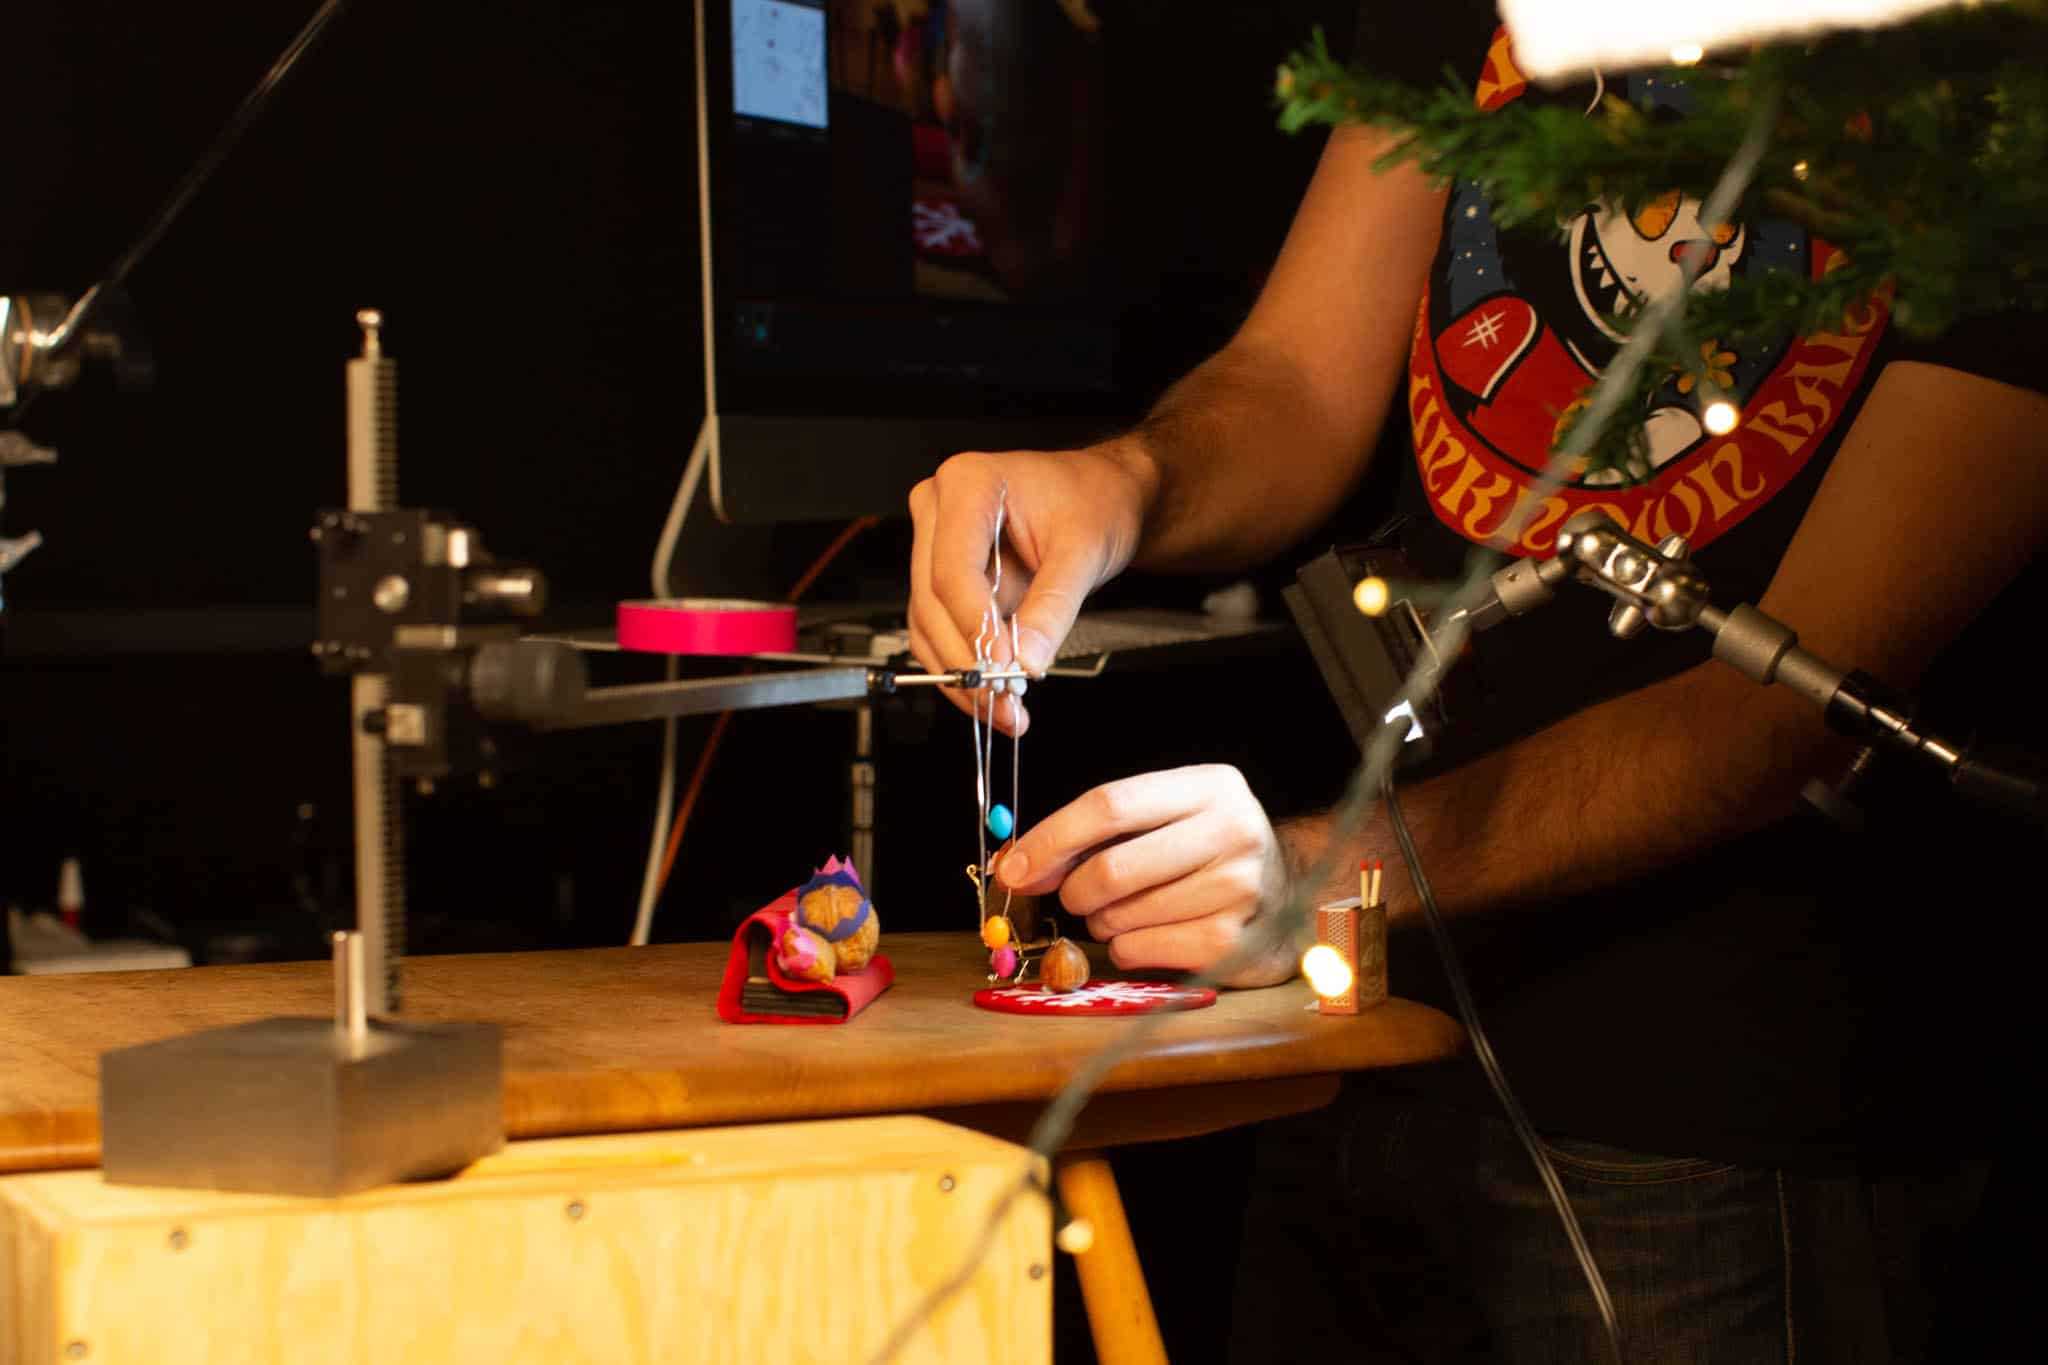 Cracking Christmas stop motion animation